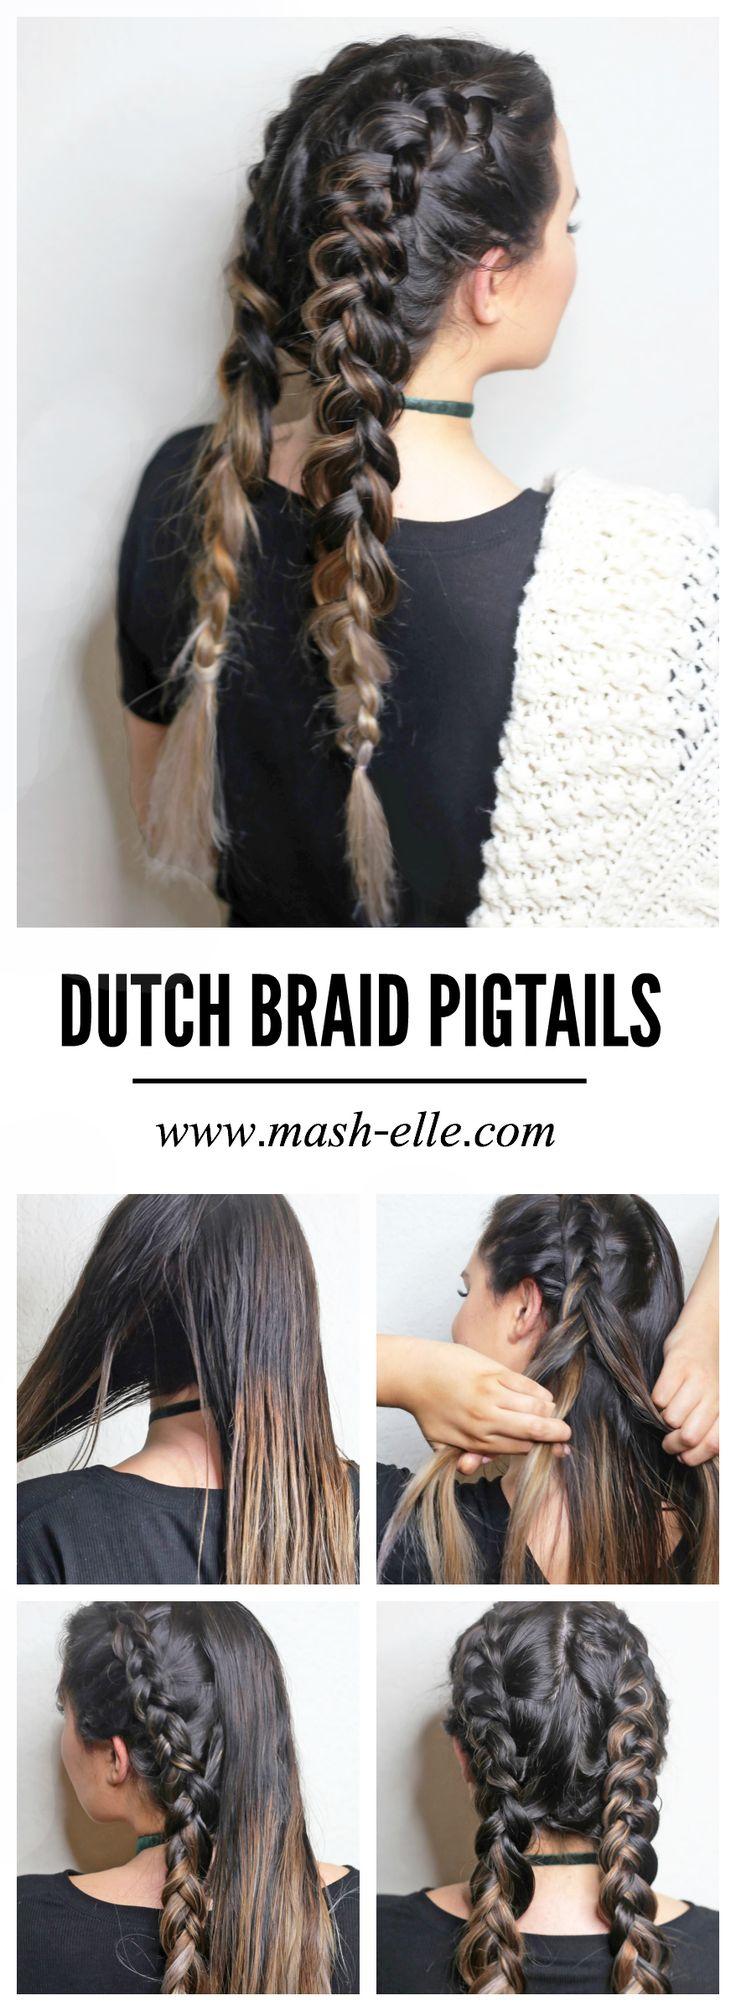 Finally A Simple And Straightforward Dutch Braid Pigtail Tutorial!  @suavebeauty @walmart You'